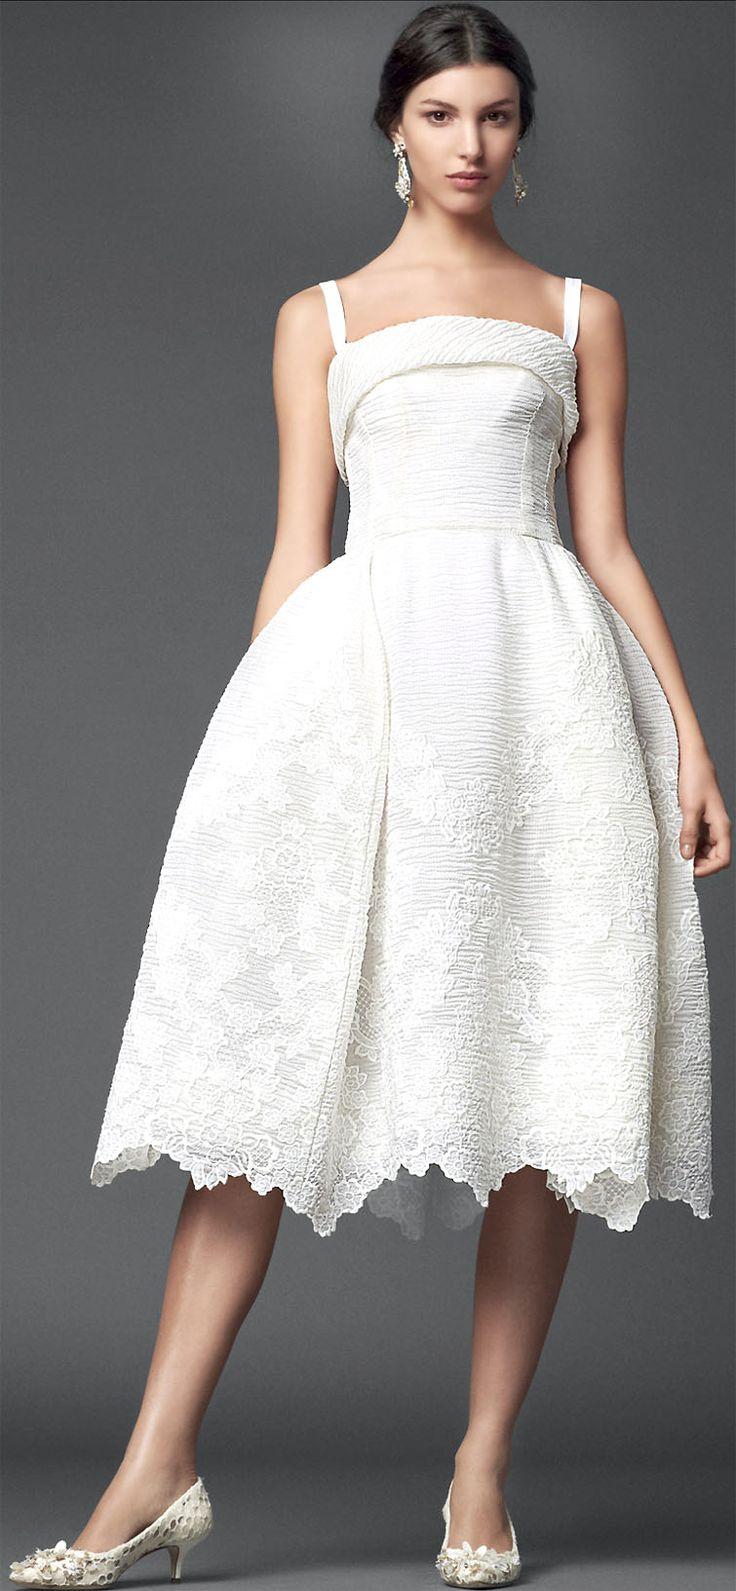 Dolce gabbana wedding attire pinterest for Dolce and gabbana wedding dresses